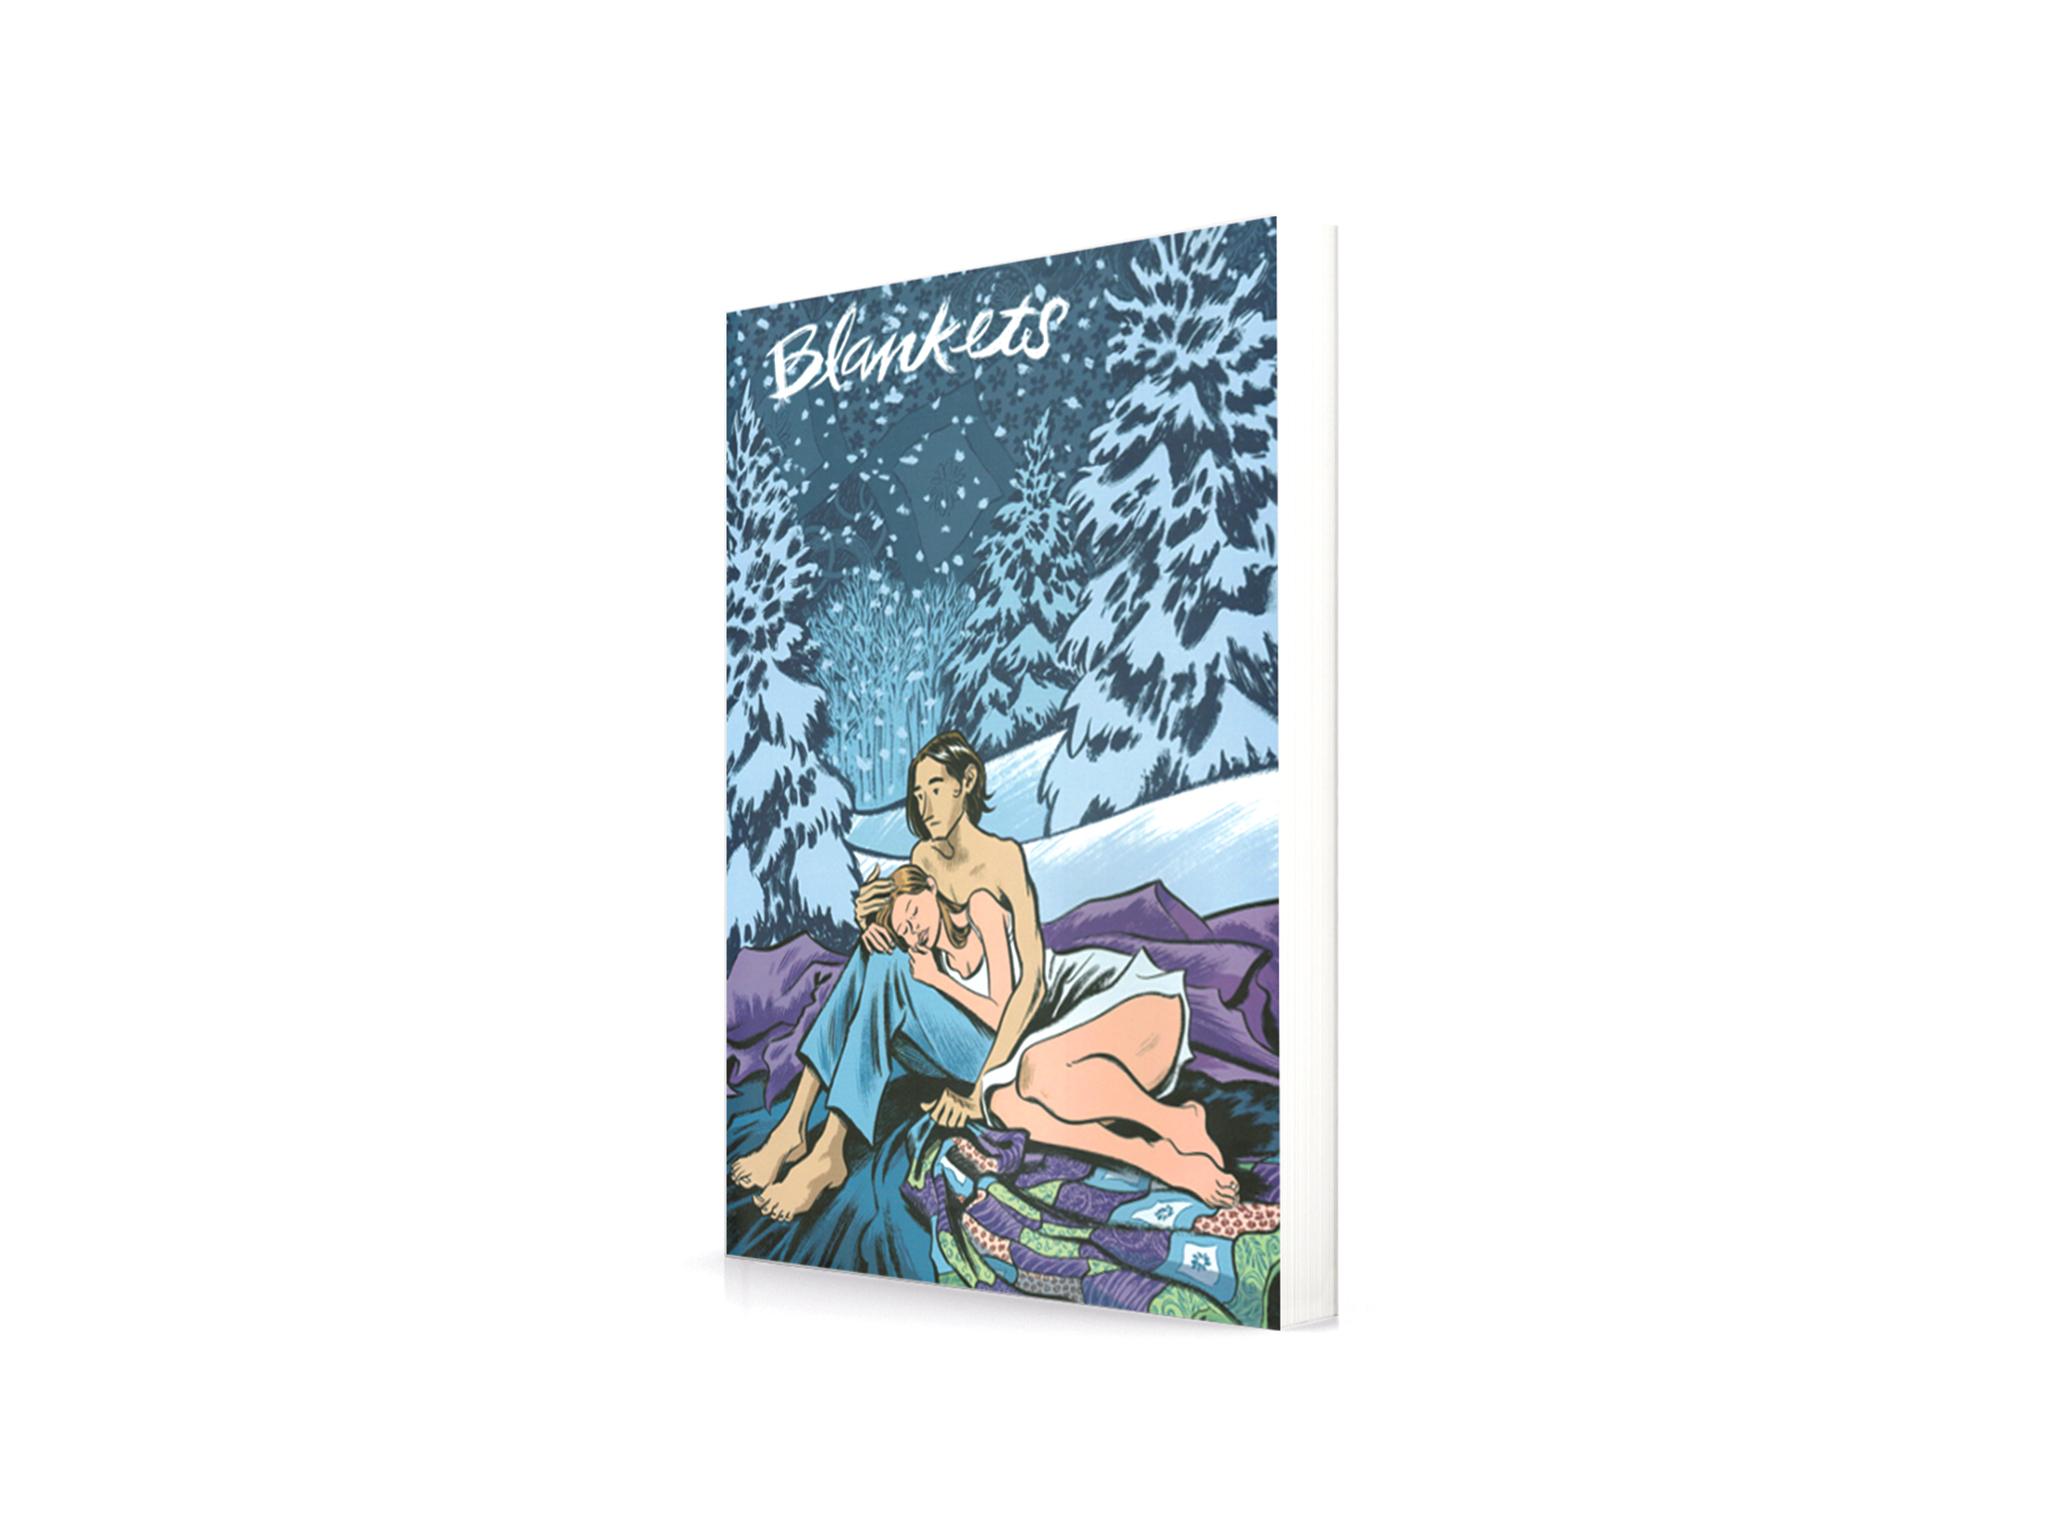 Livros, Romance, Blankets, Craig Thomson